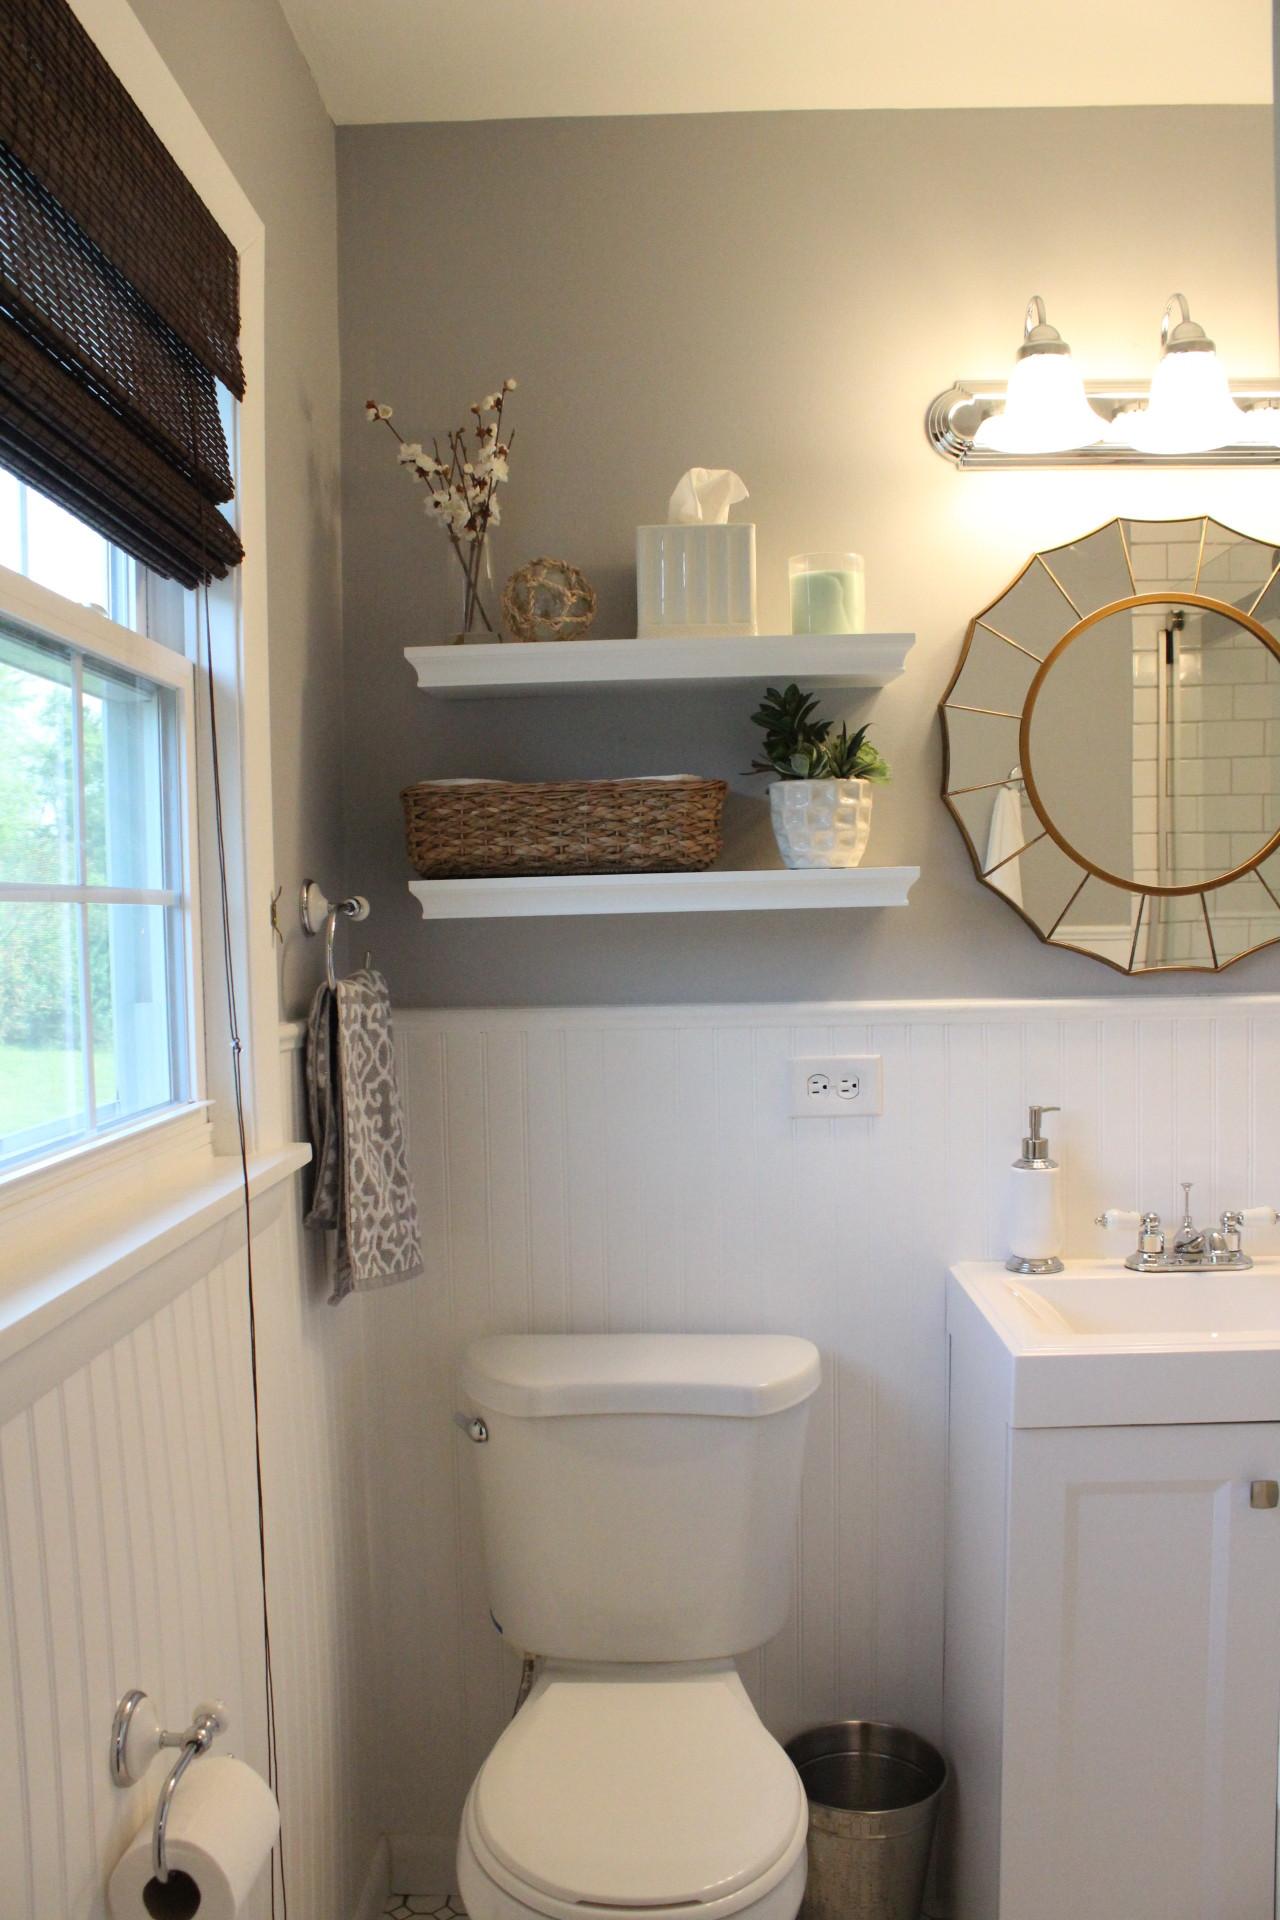 Bathrooms | 12 Oaks | Page 2